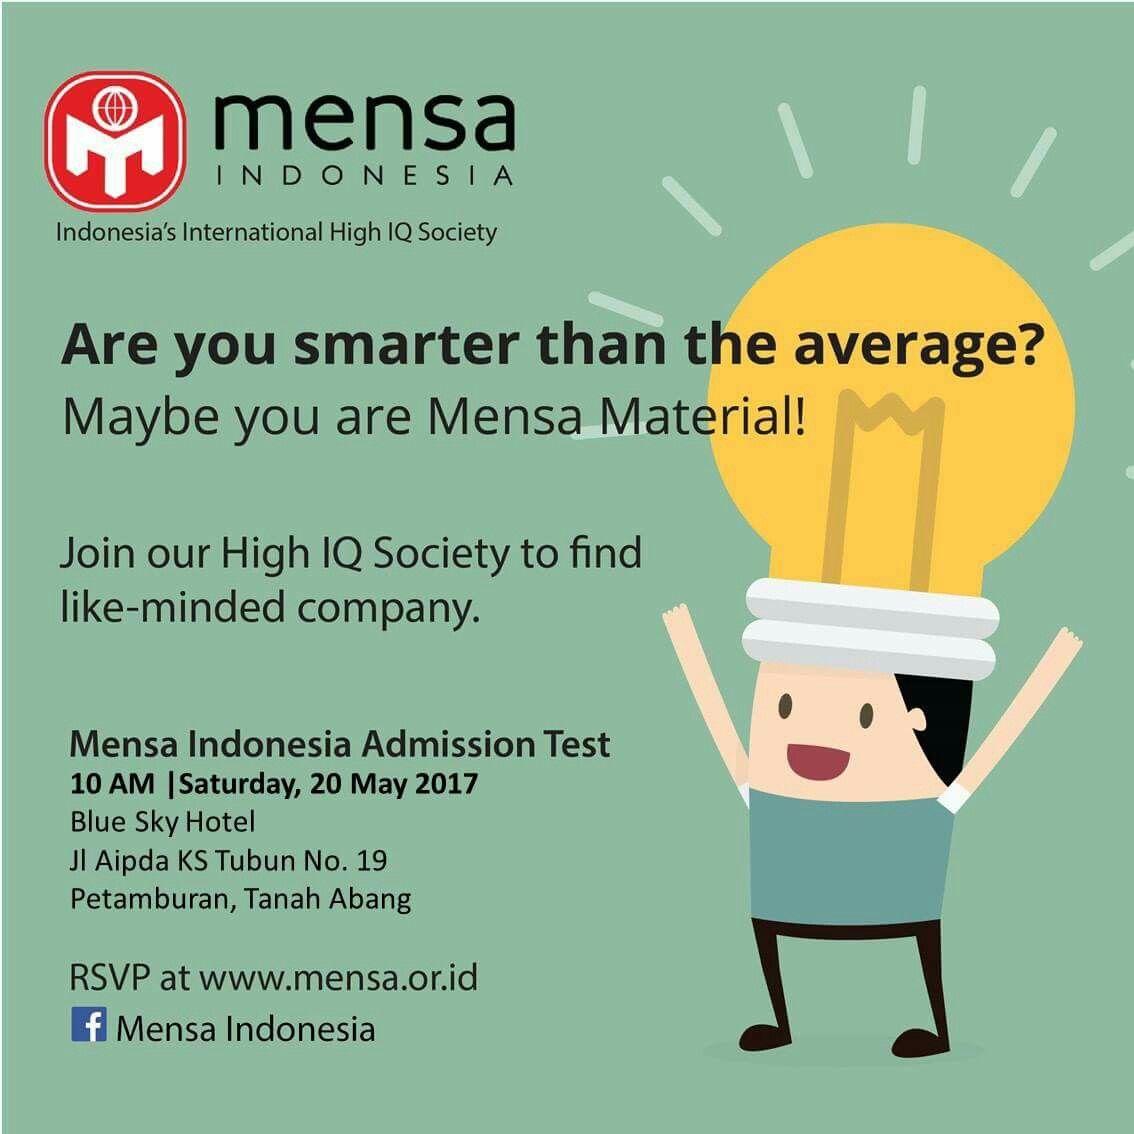 Pin by Sahat Simarmata on Mensa Indonesia | Mensa test, Blue sky hotel